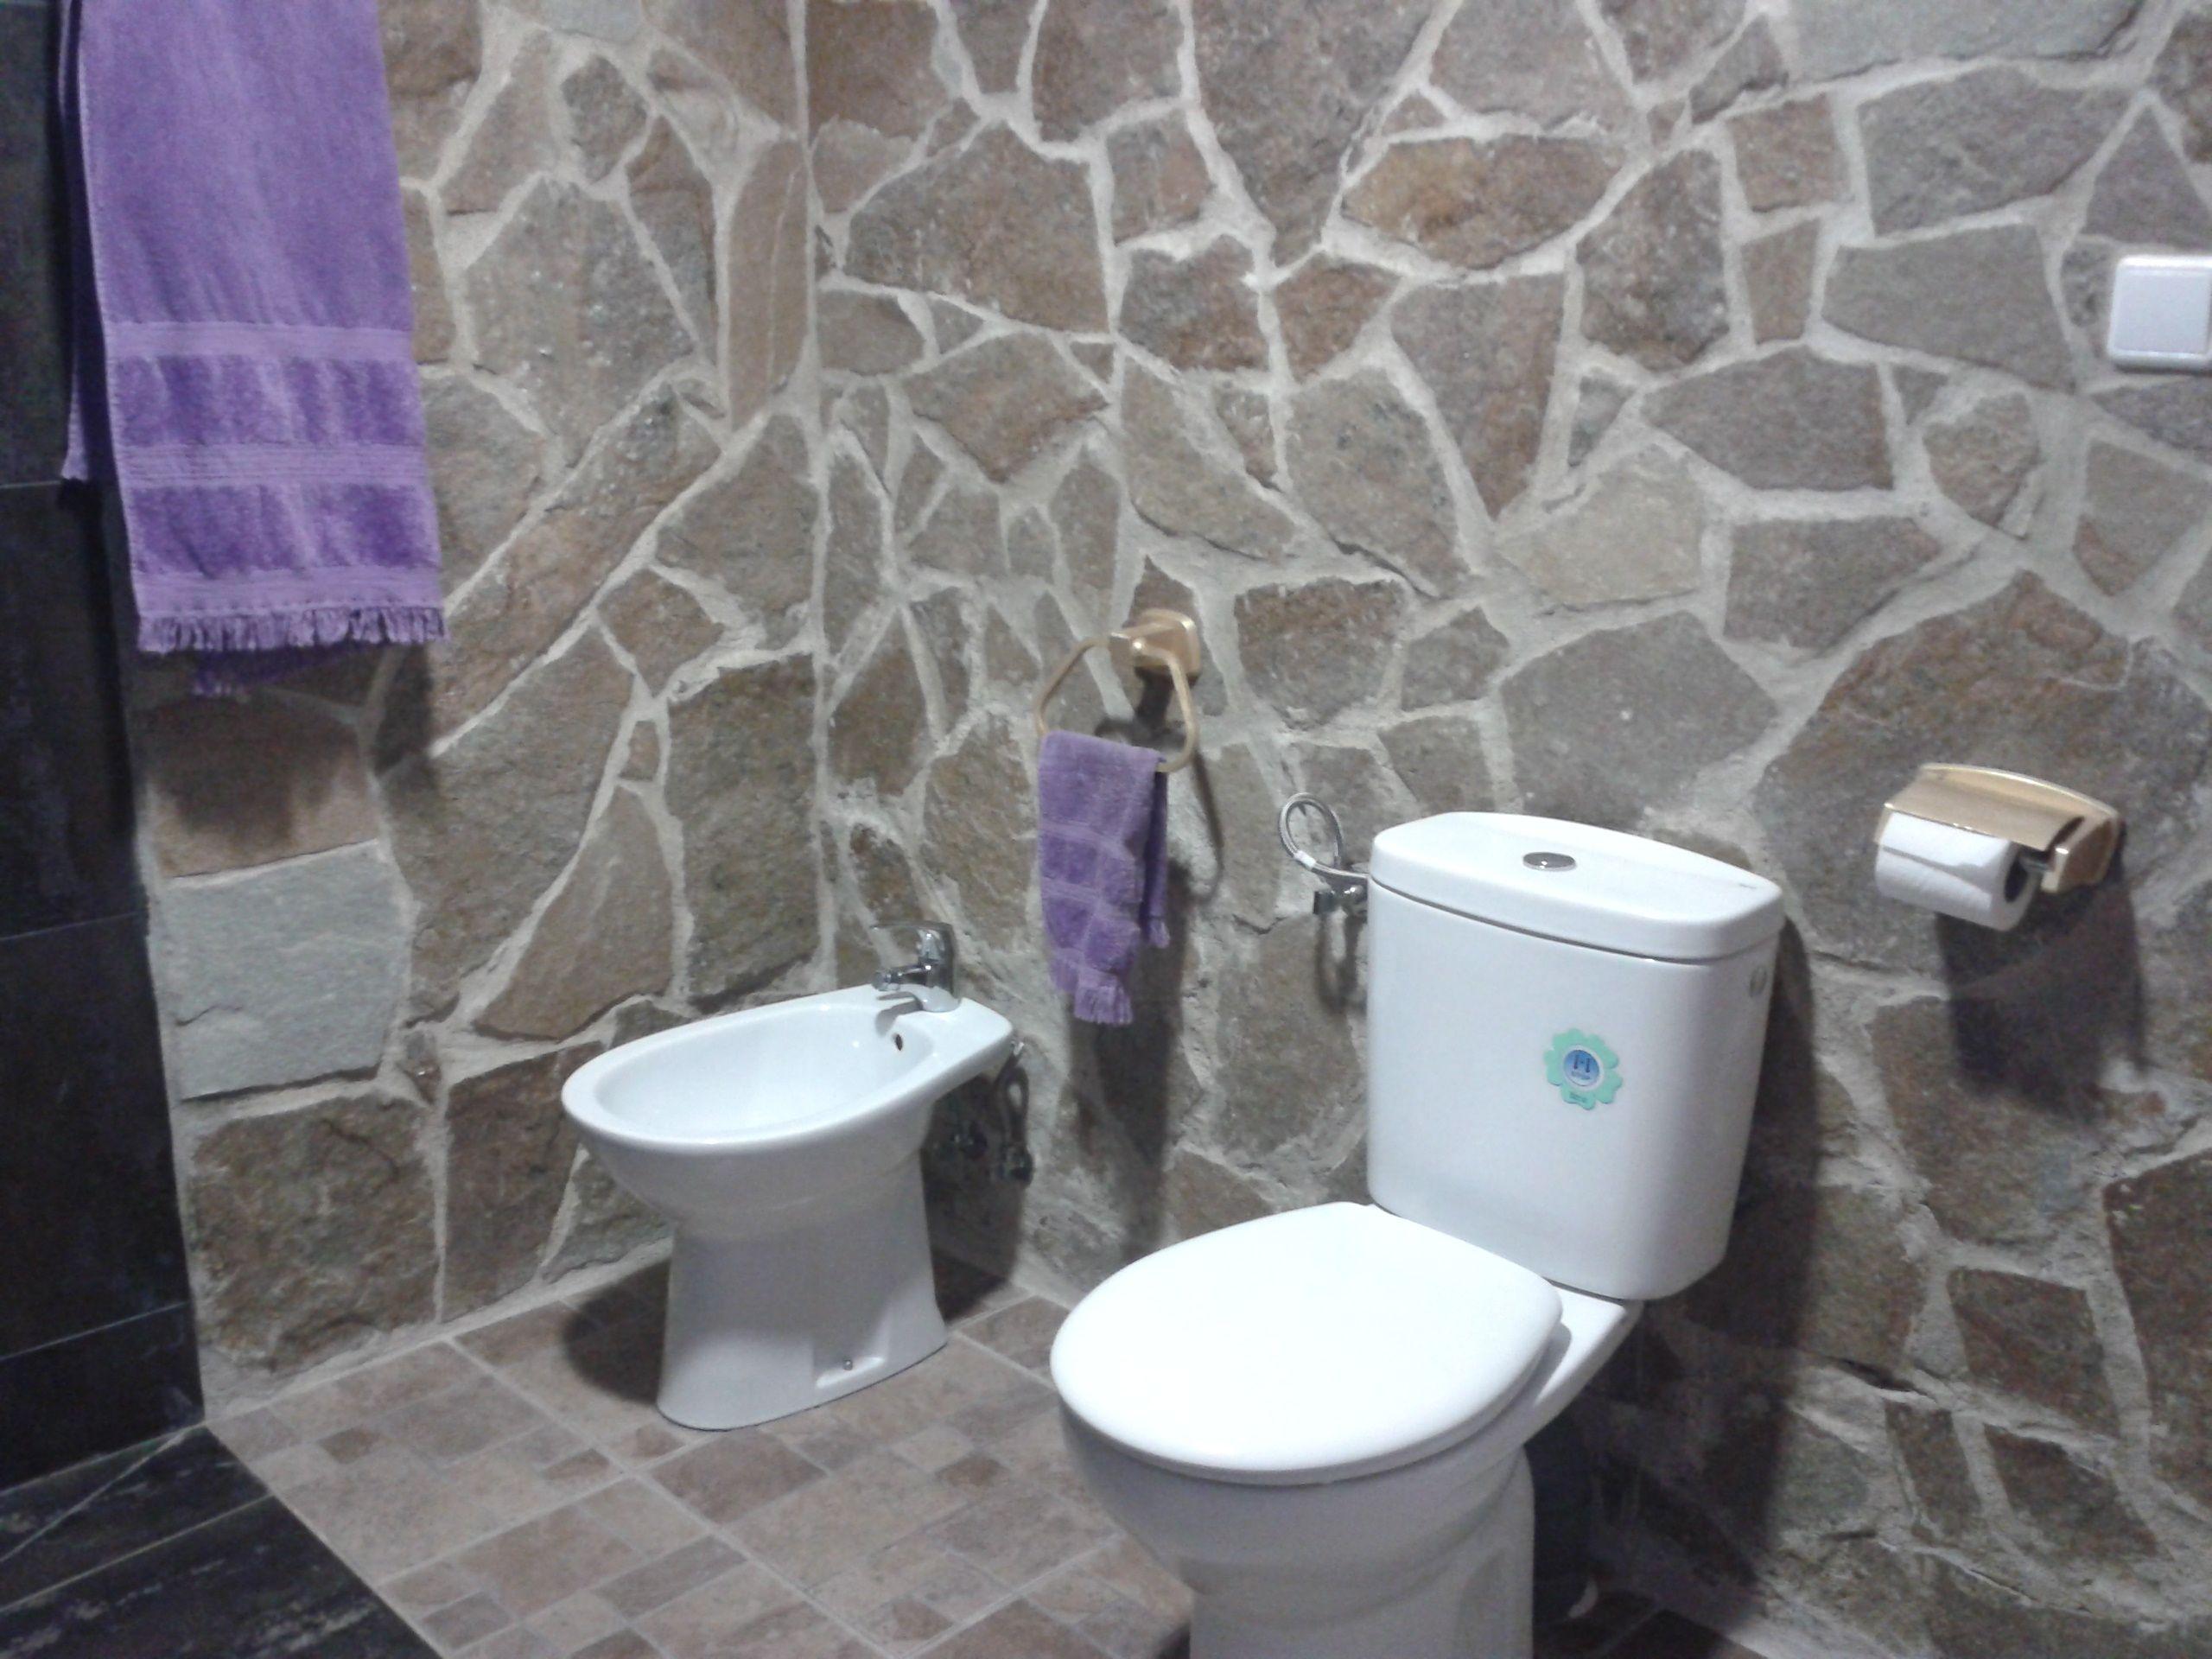 Ba o de corado con paredes de piedra decoraci n y dise o - Banos con paredes de piedra ...